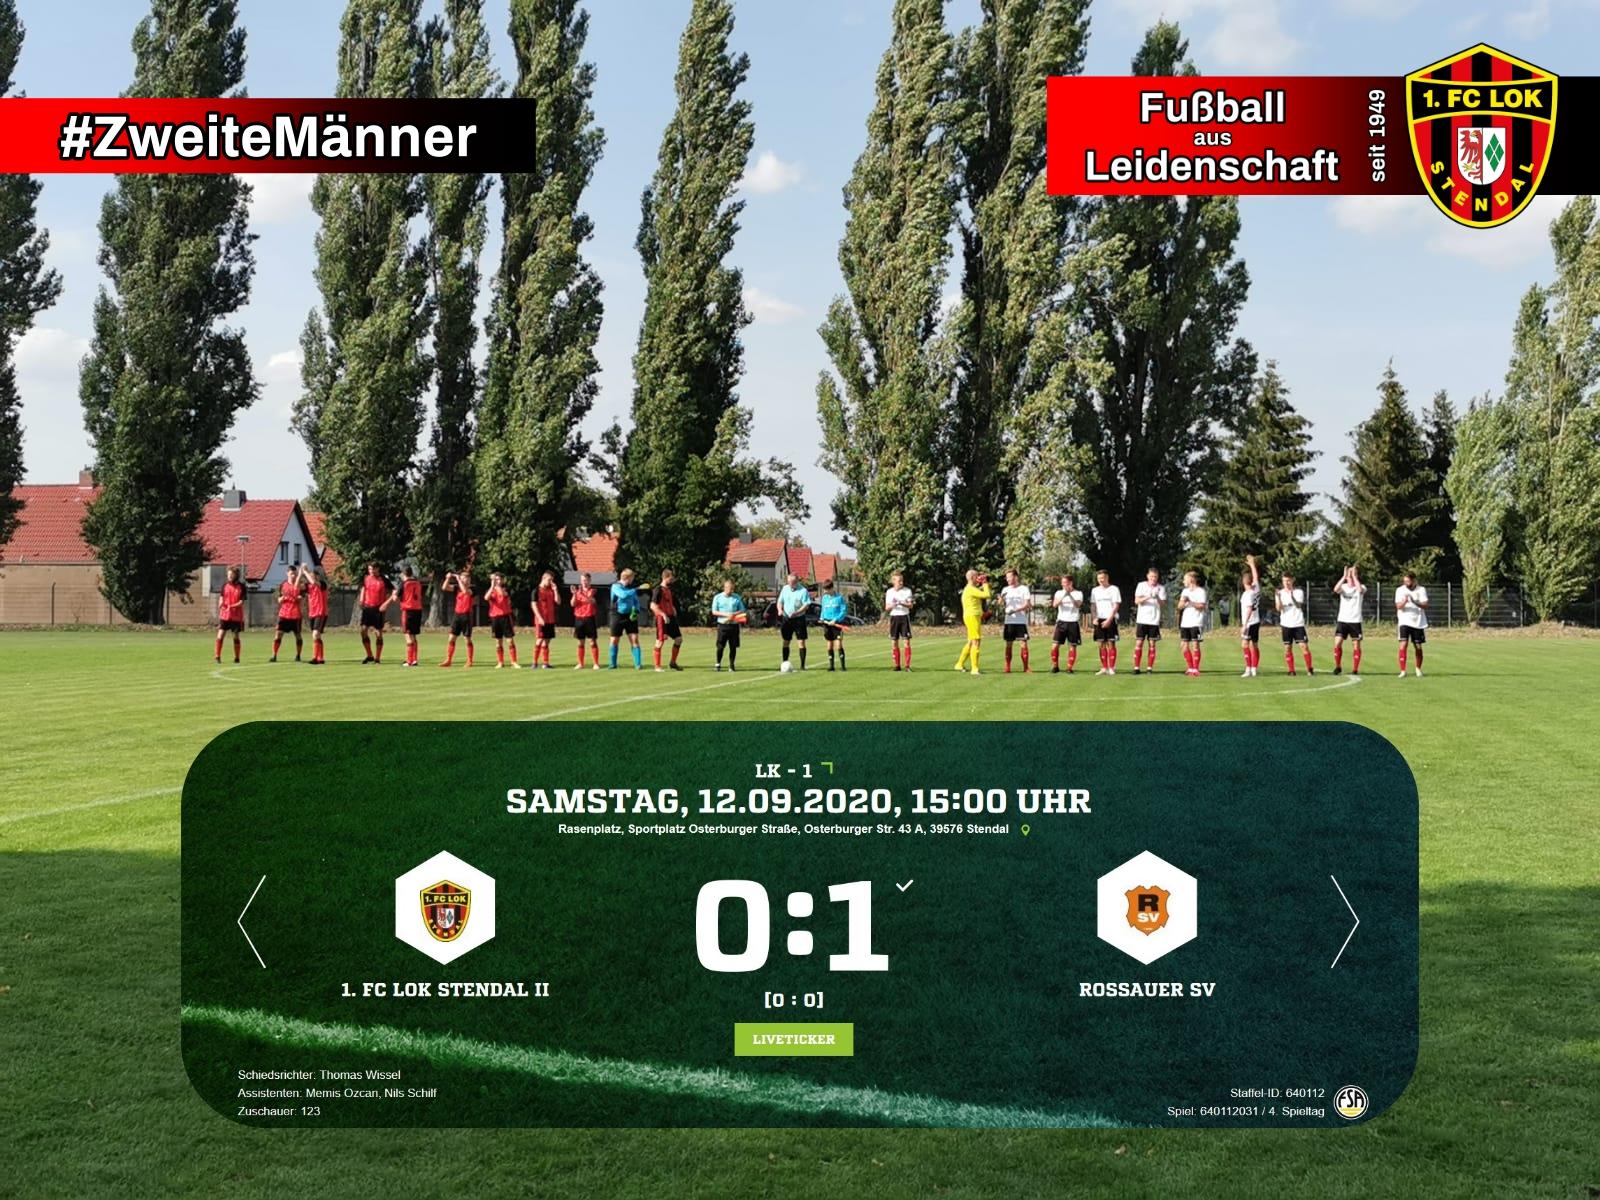 Landesklasse 1 ► 4. Spieltag - 1. FC Lok Stendal